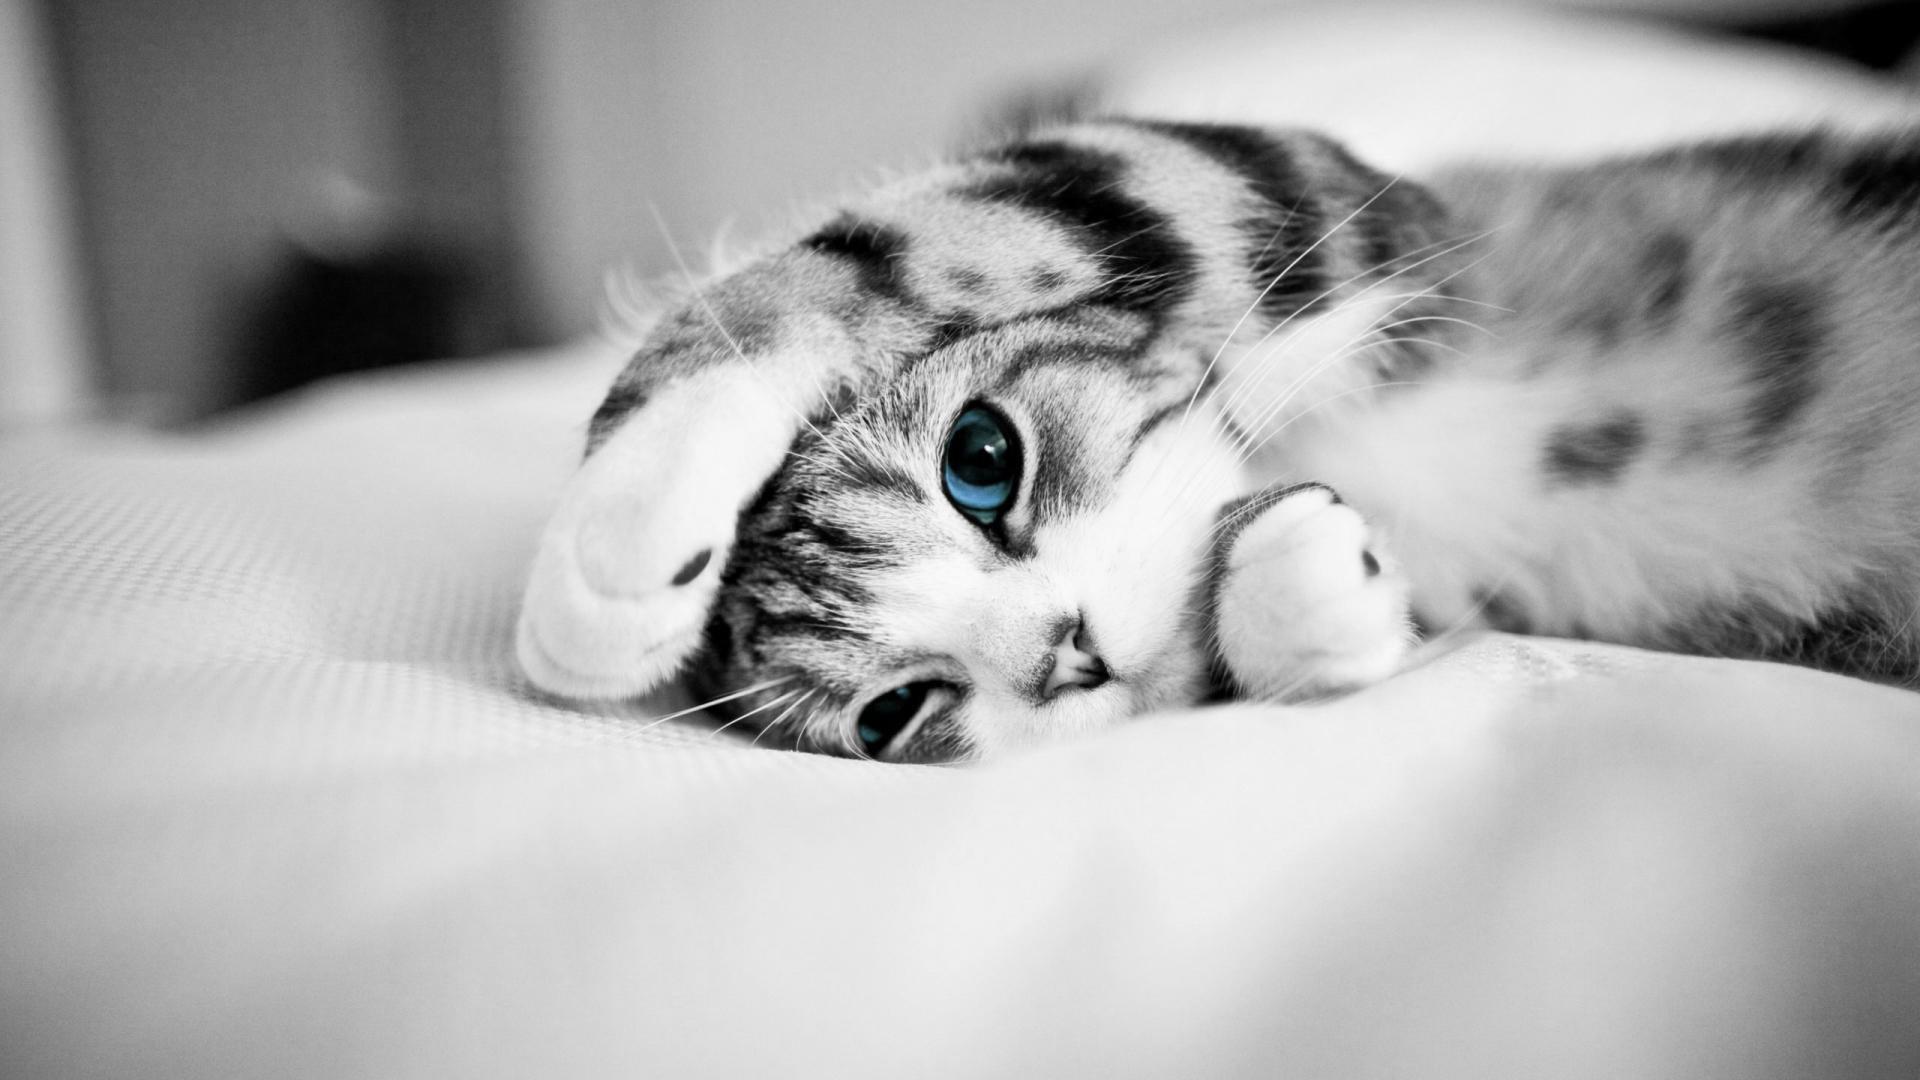 Blue eyed cat - Monochrome photography wallpaper